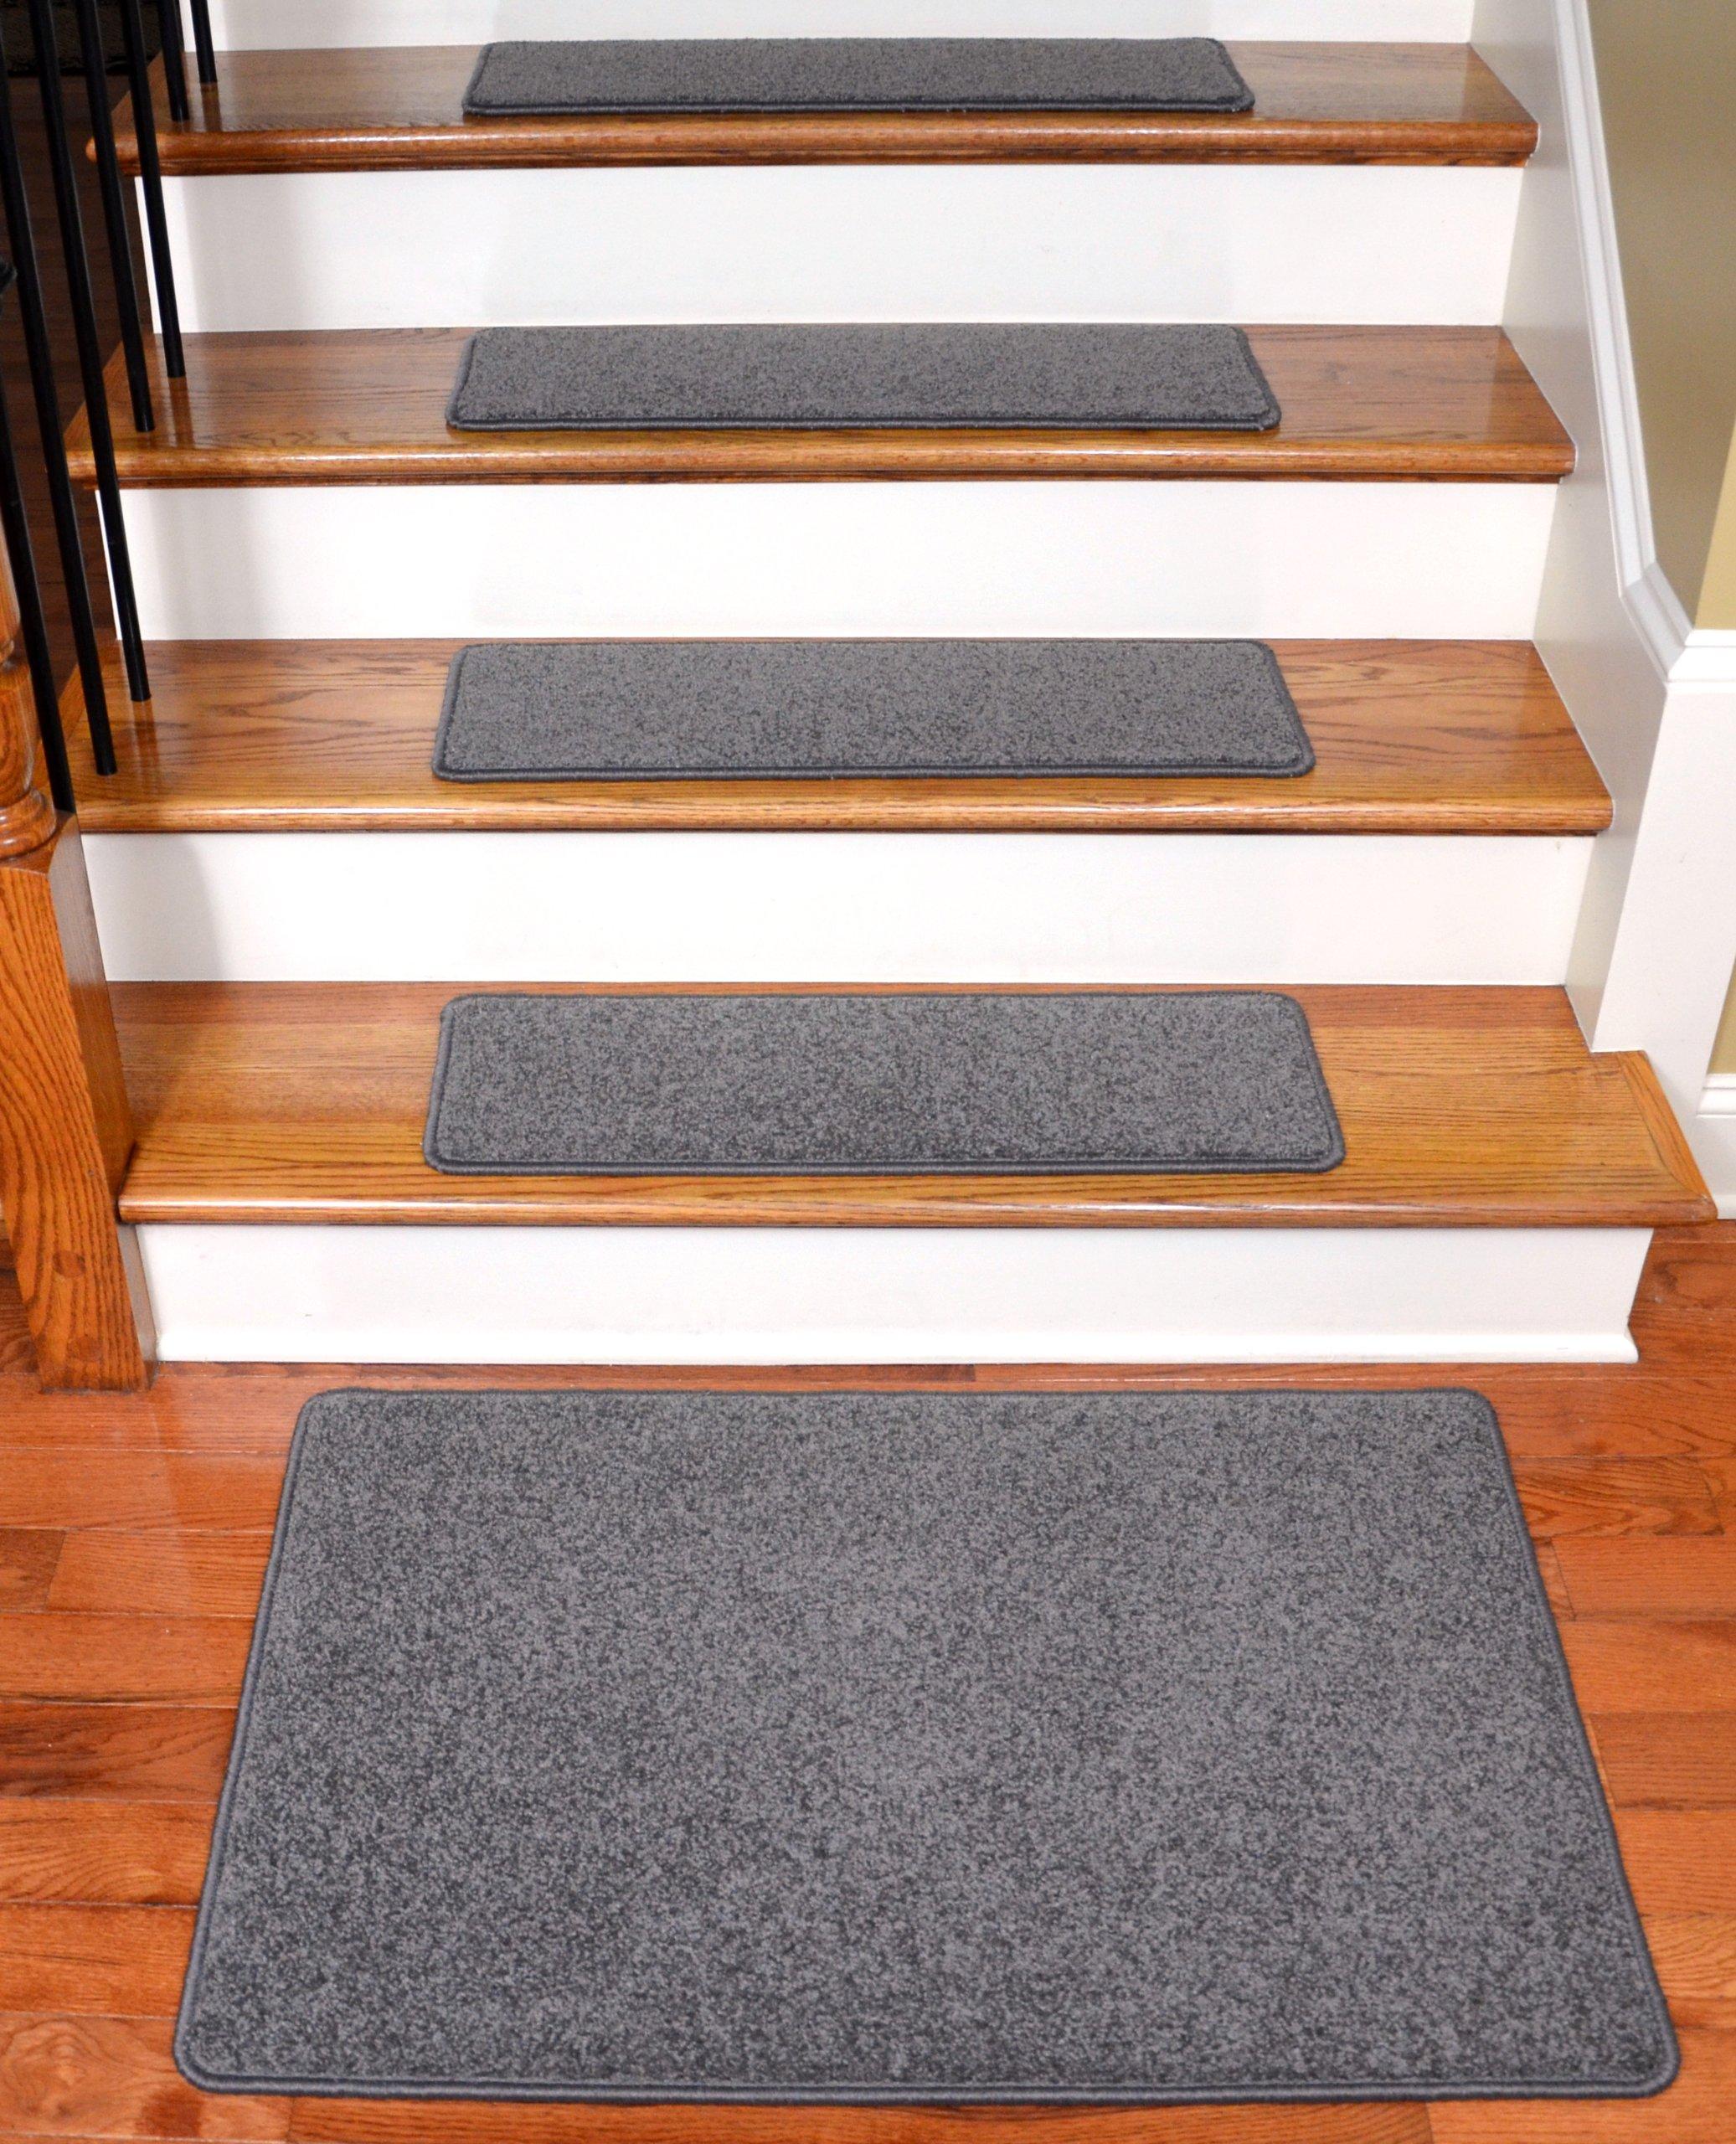 Dean Carpet Stair Treads 27'' x 9'' Gray Plush (Set of 13) Plus a 2' x 3' Mat